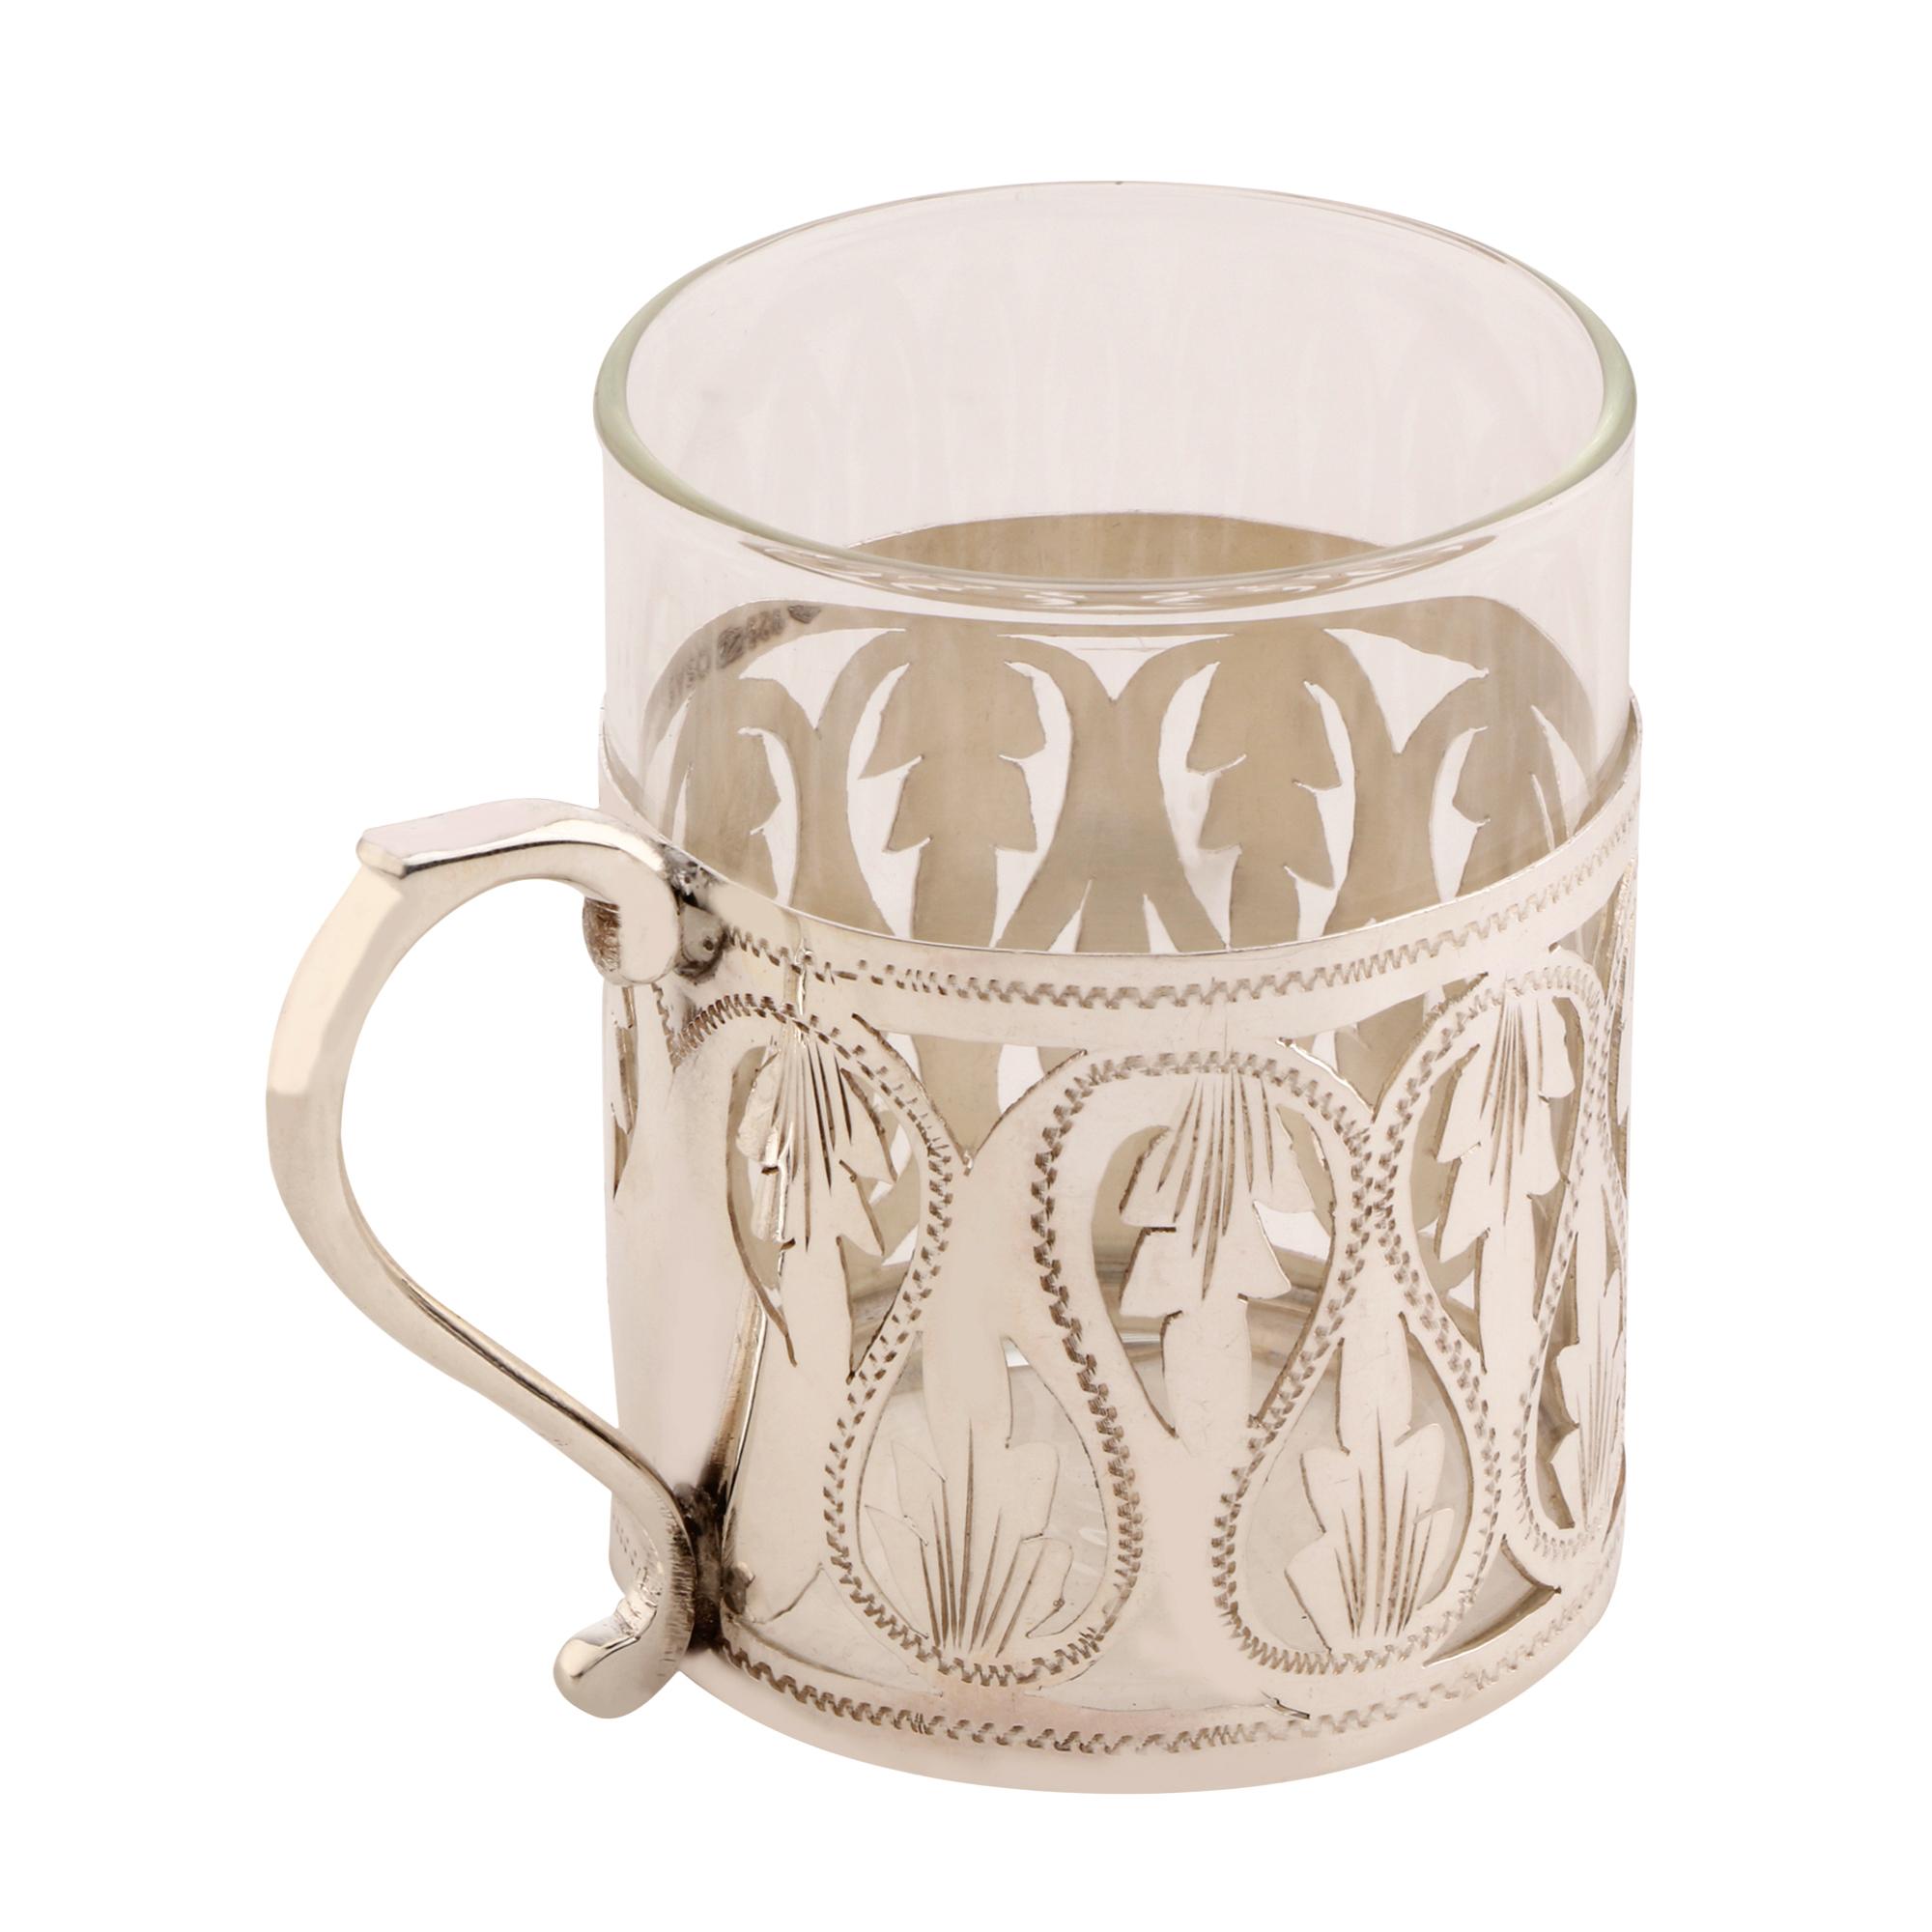 Osasbazaar Sterling Silver & Borosilicate Tea Cup, Coffee Mug - Side